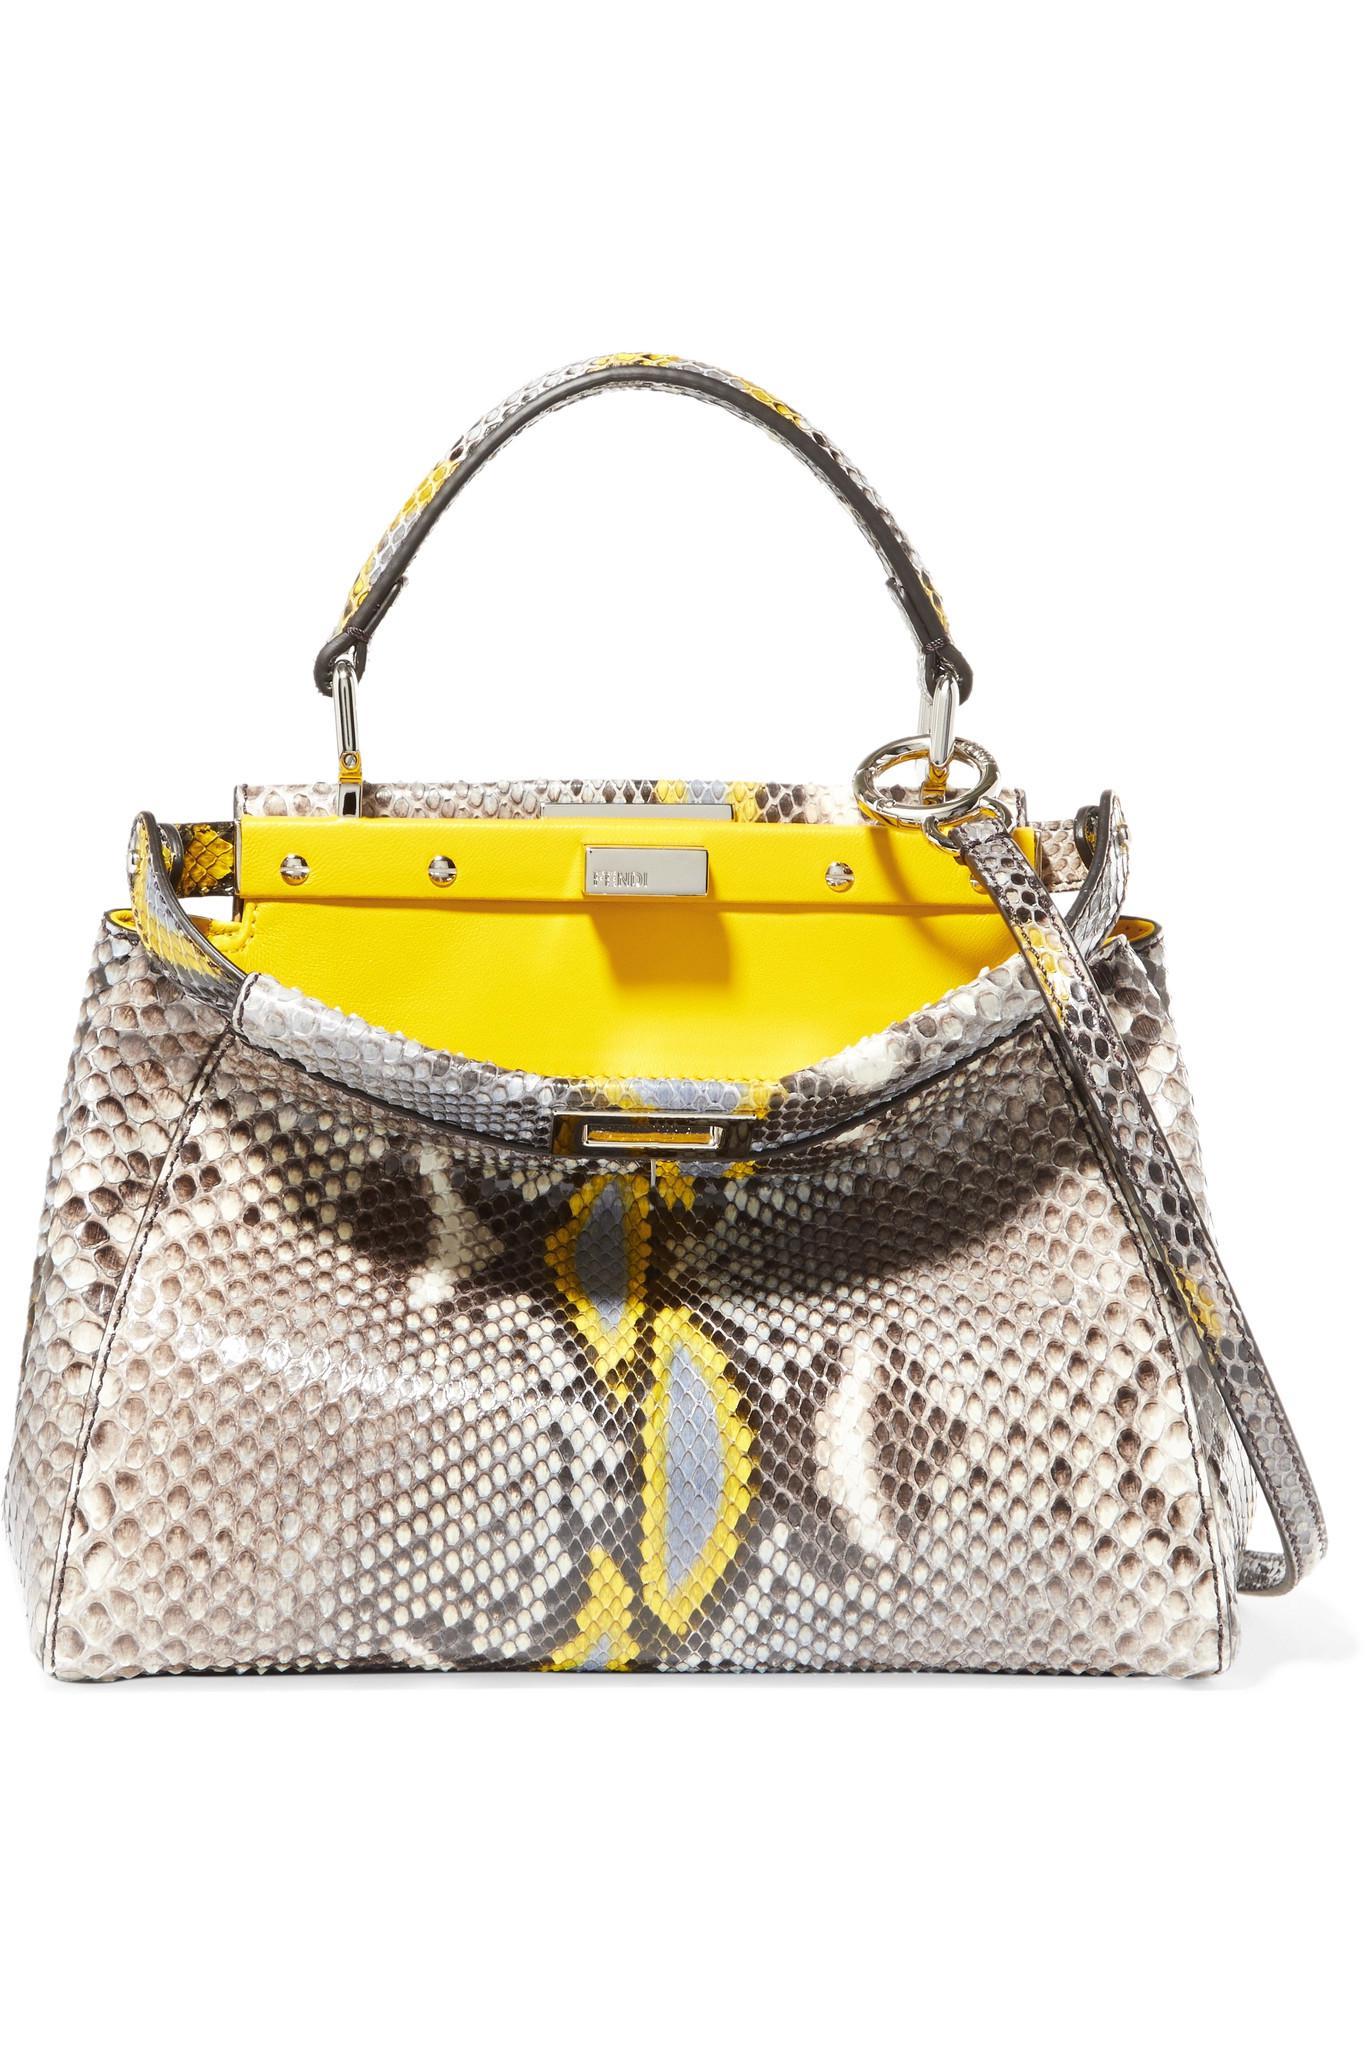 52004e3d64 discount fendi peekaboo python leather handbag. ea788 24d4b; australia fendi  peekaboo mini python shoulder bag in yellow lyst 414e2 f04bf